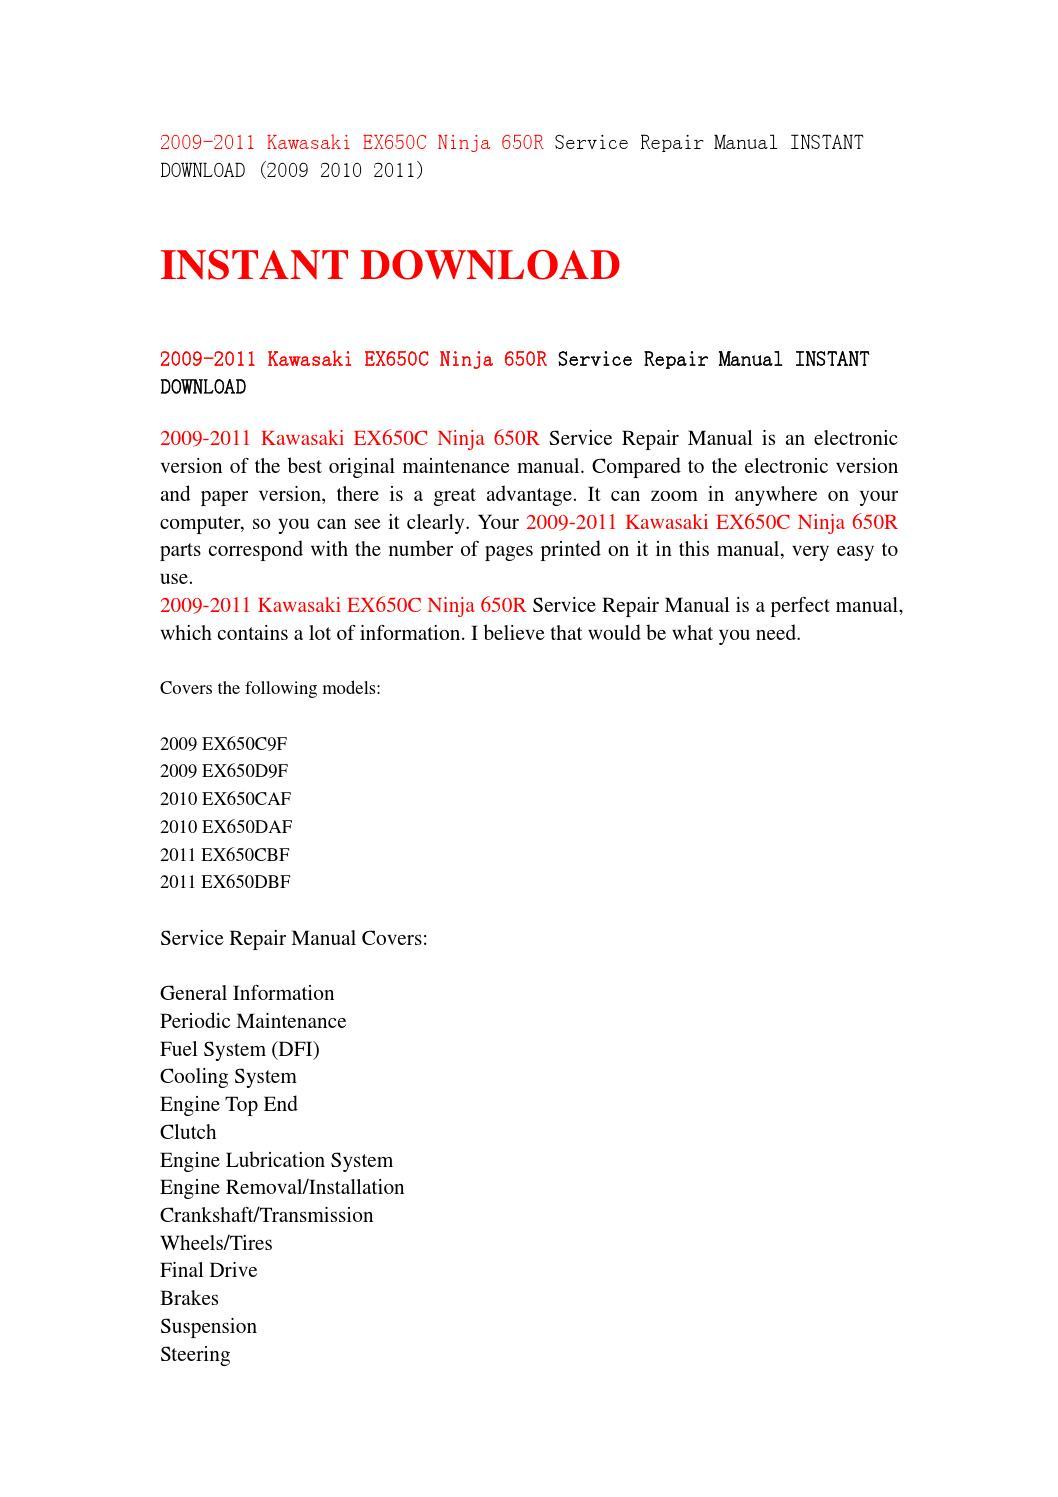 2011 Kawasaki Ninja 650r Parts Diagram Schematic Diagrams Engine 2009 Ex650c Service Repair Manual Instant 08